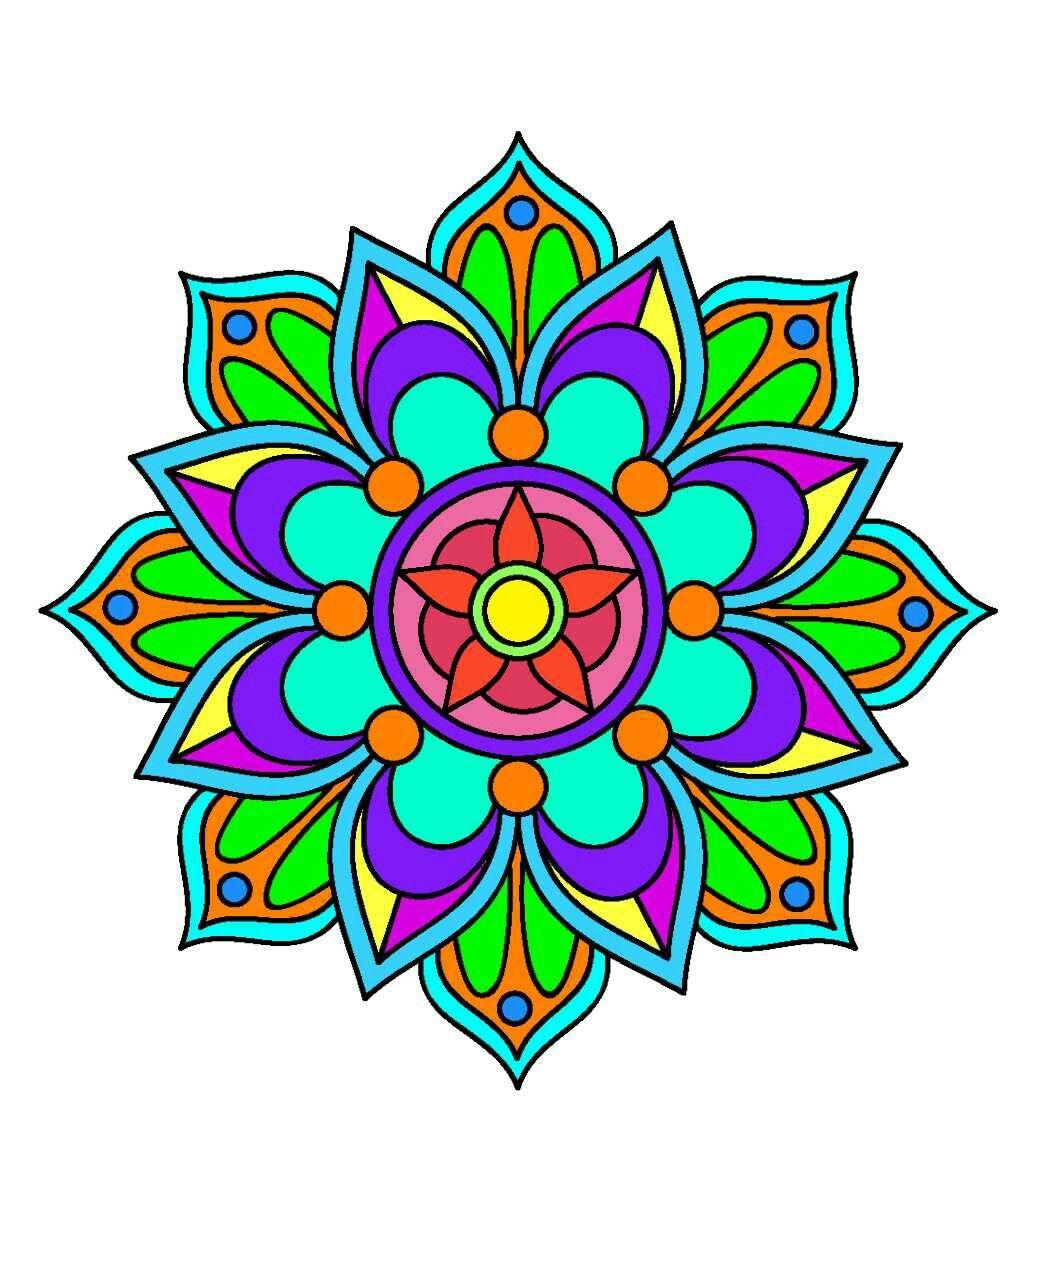 Mandala 02   patrones para bordar   Pinterest   Mandalas, Piedras y ...